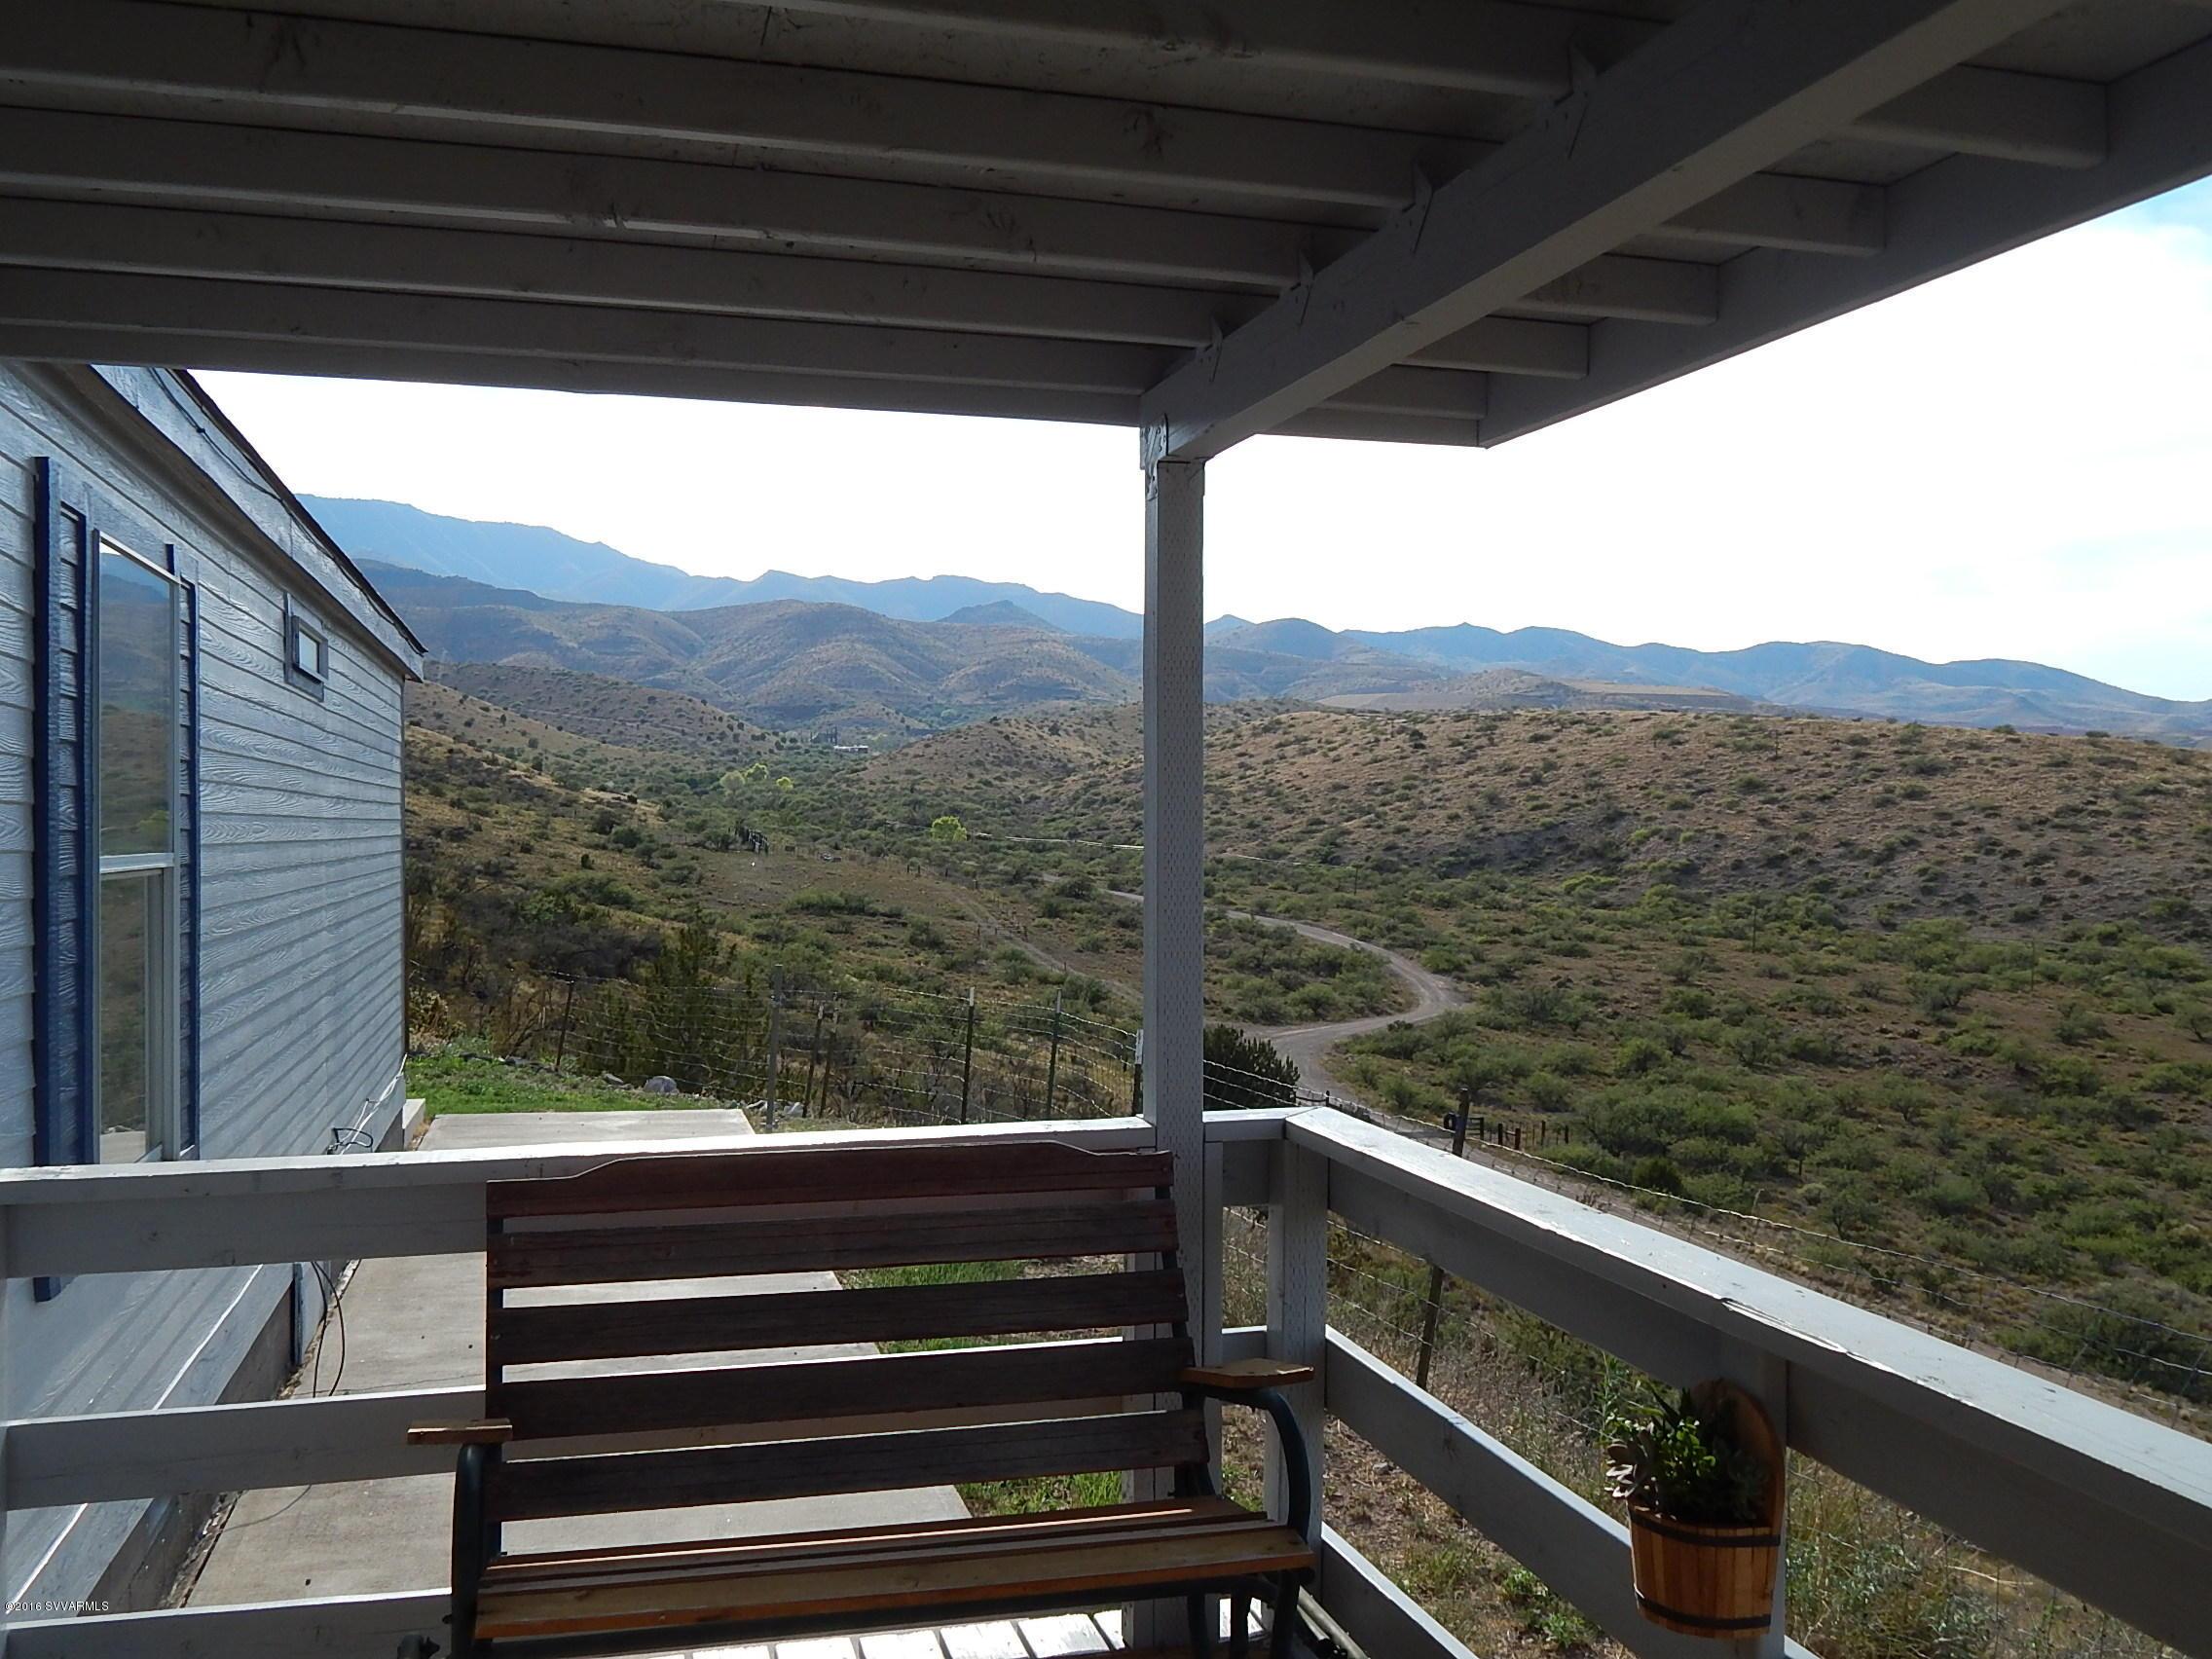 4501 W Hopewell Mine Rd Clarkdale, AZ 86324